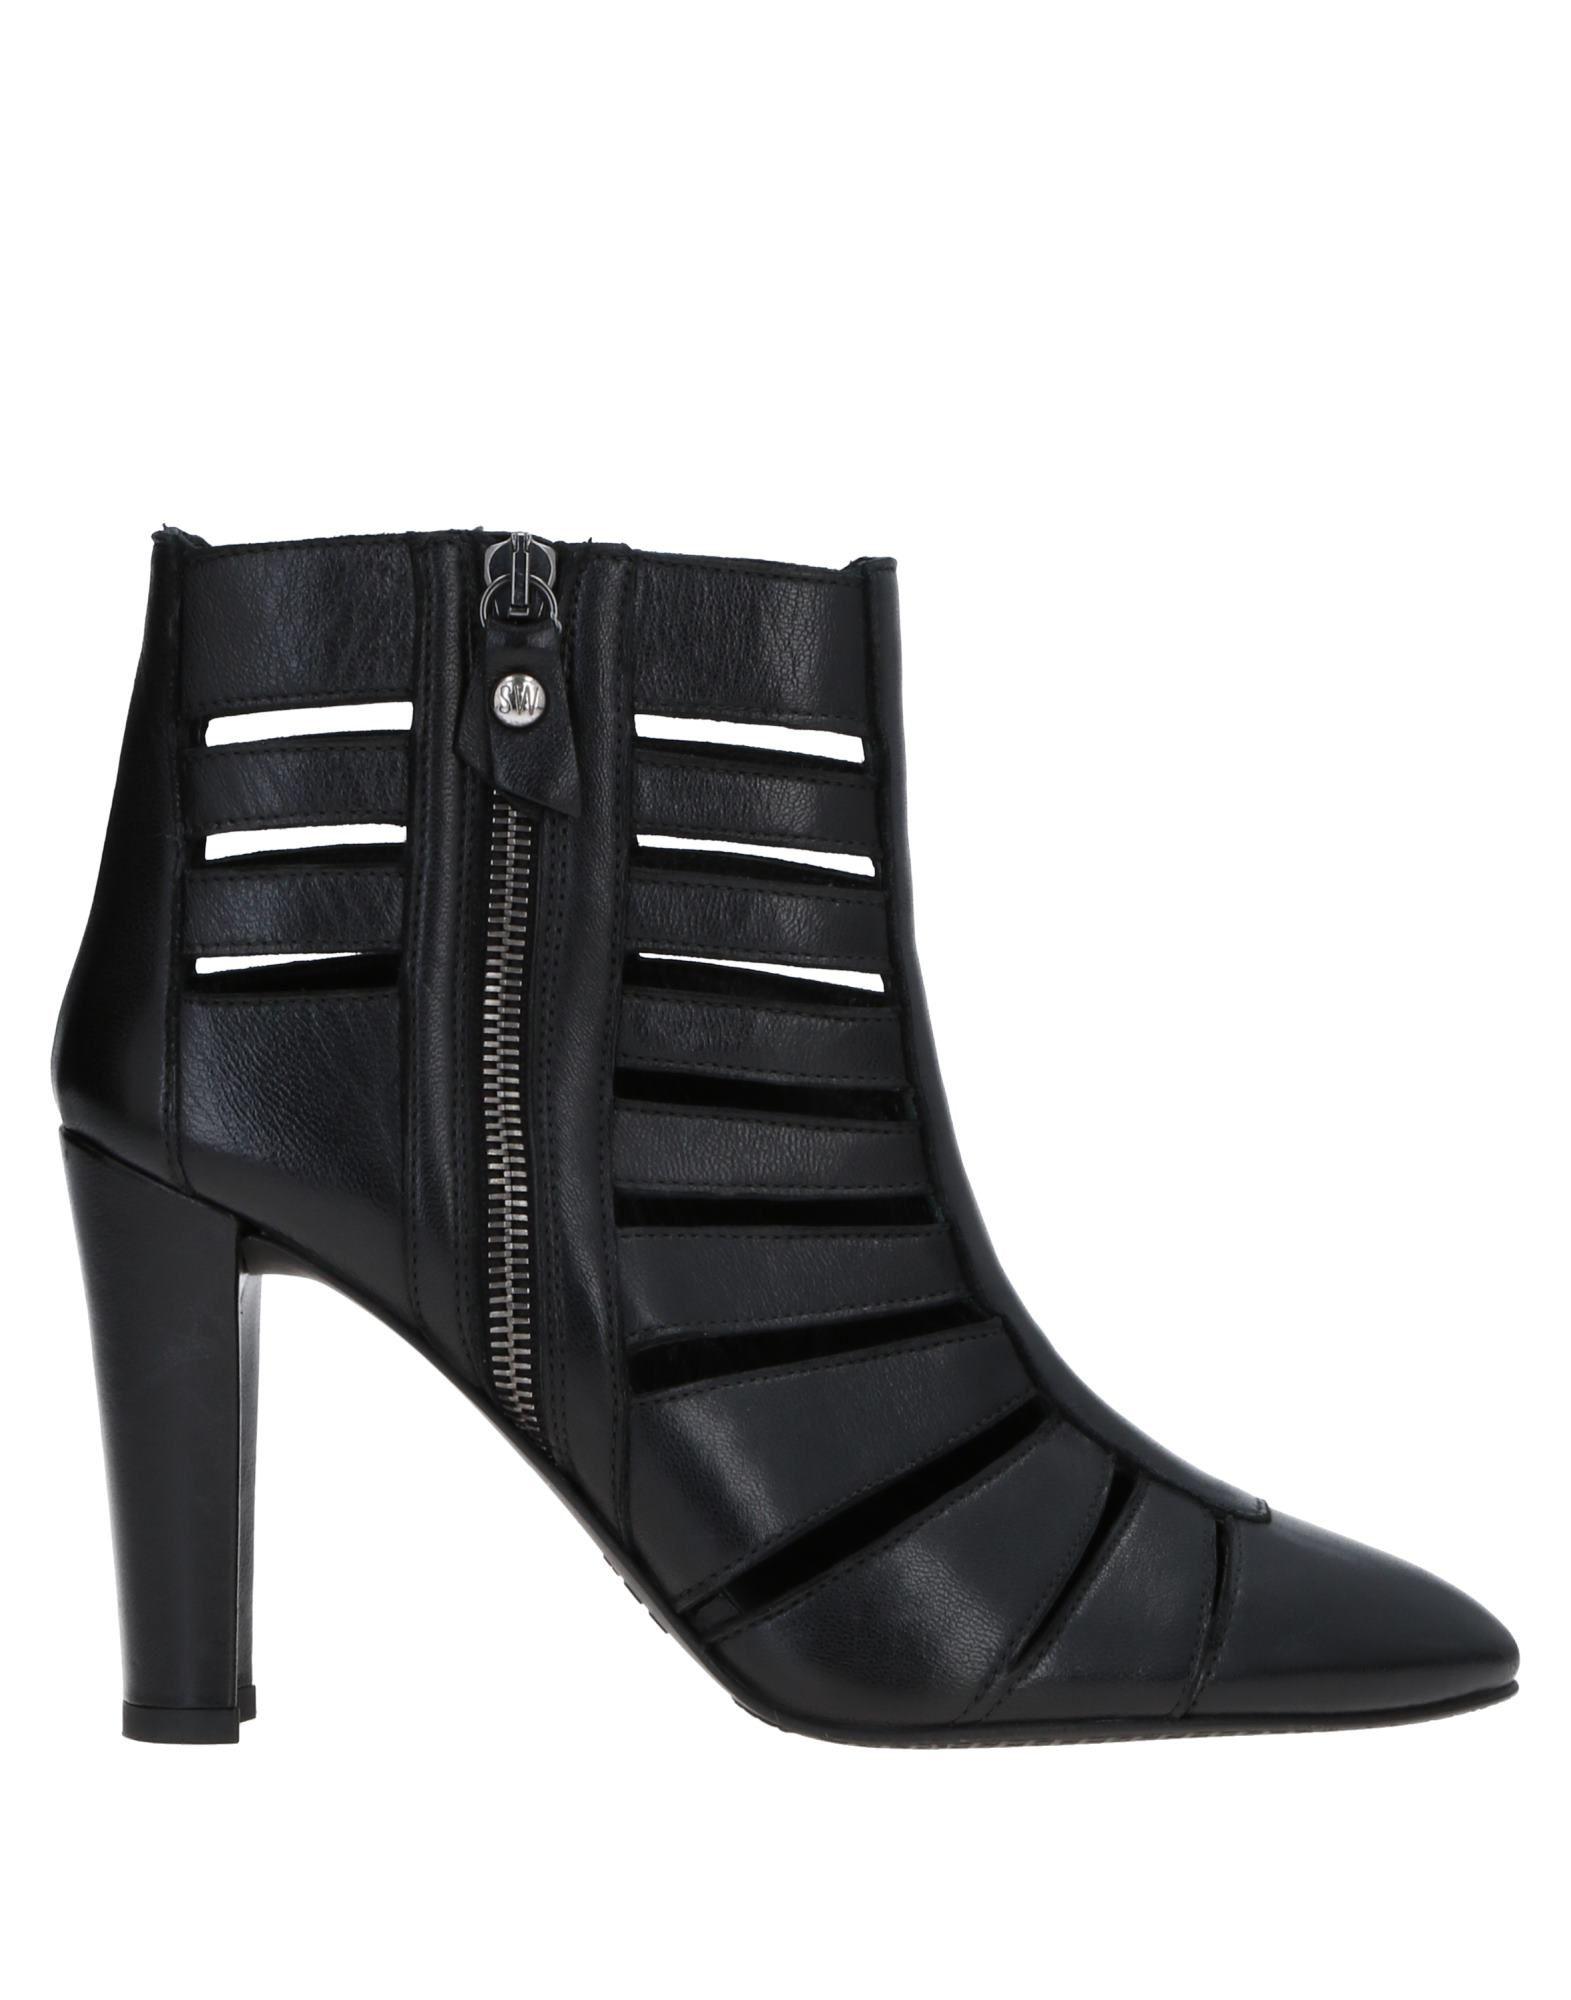 Stuart Weitzman Ankle Boot Ankle - Women Stuart Weitzman Ankle Boot Boots online on  Australia - 11515940NK 6fd3a3